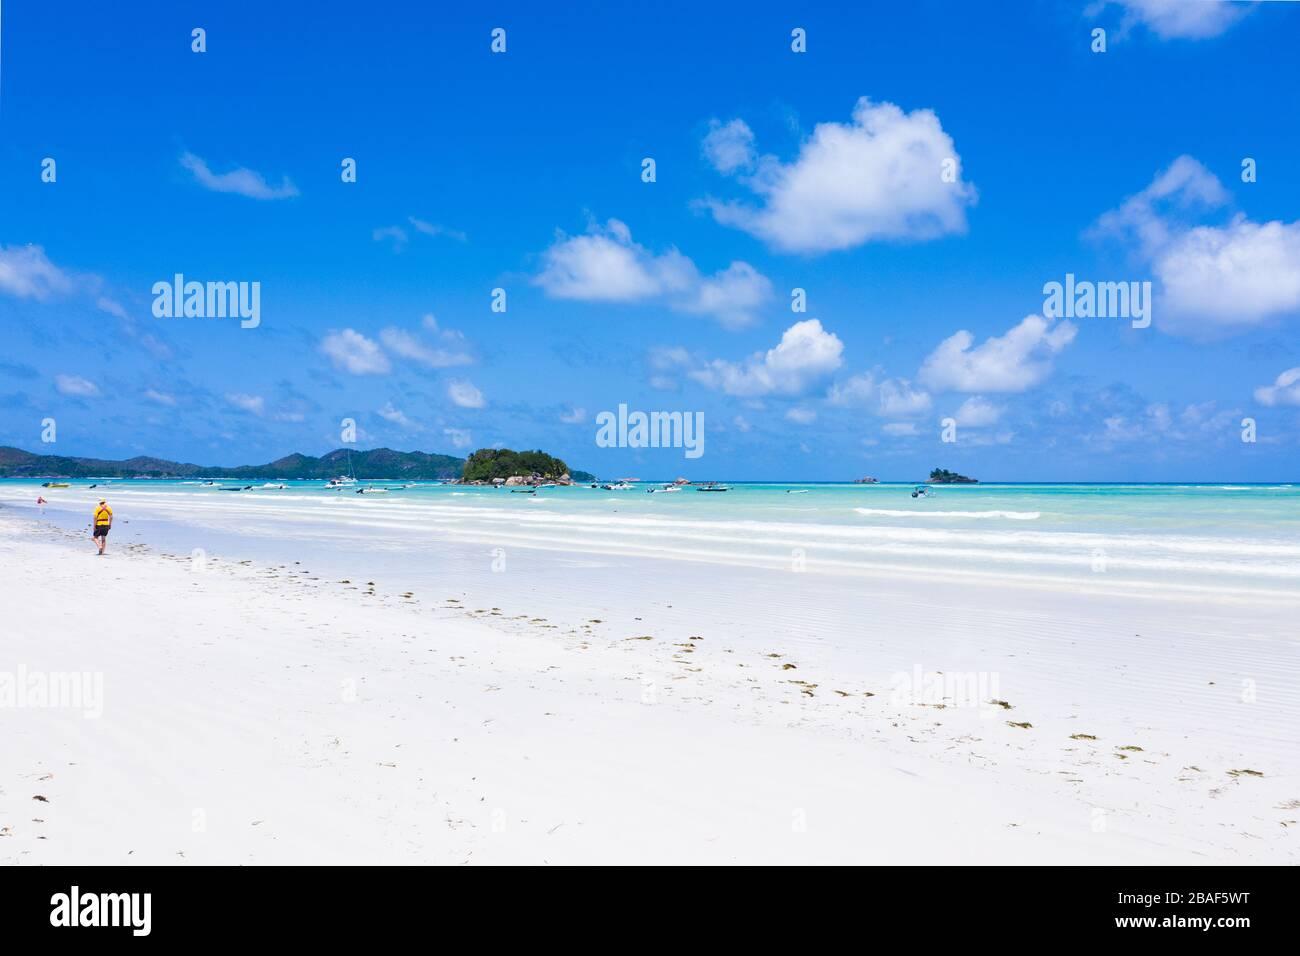 Anse Volbert aerial beach view Praslin Island Seychelles Stock Photo